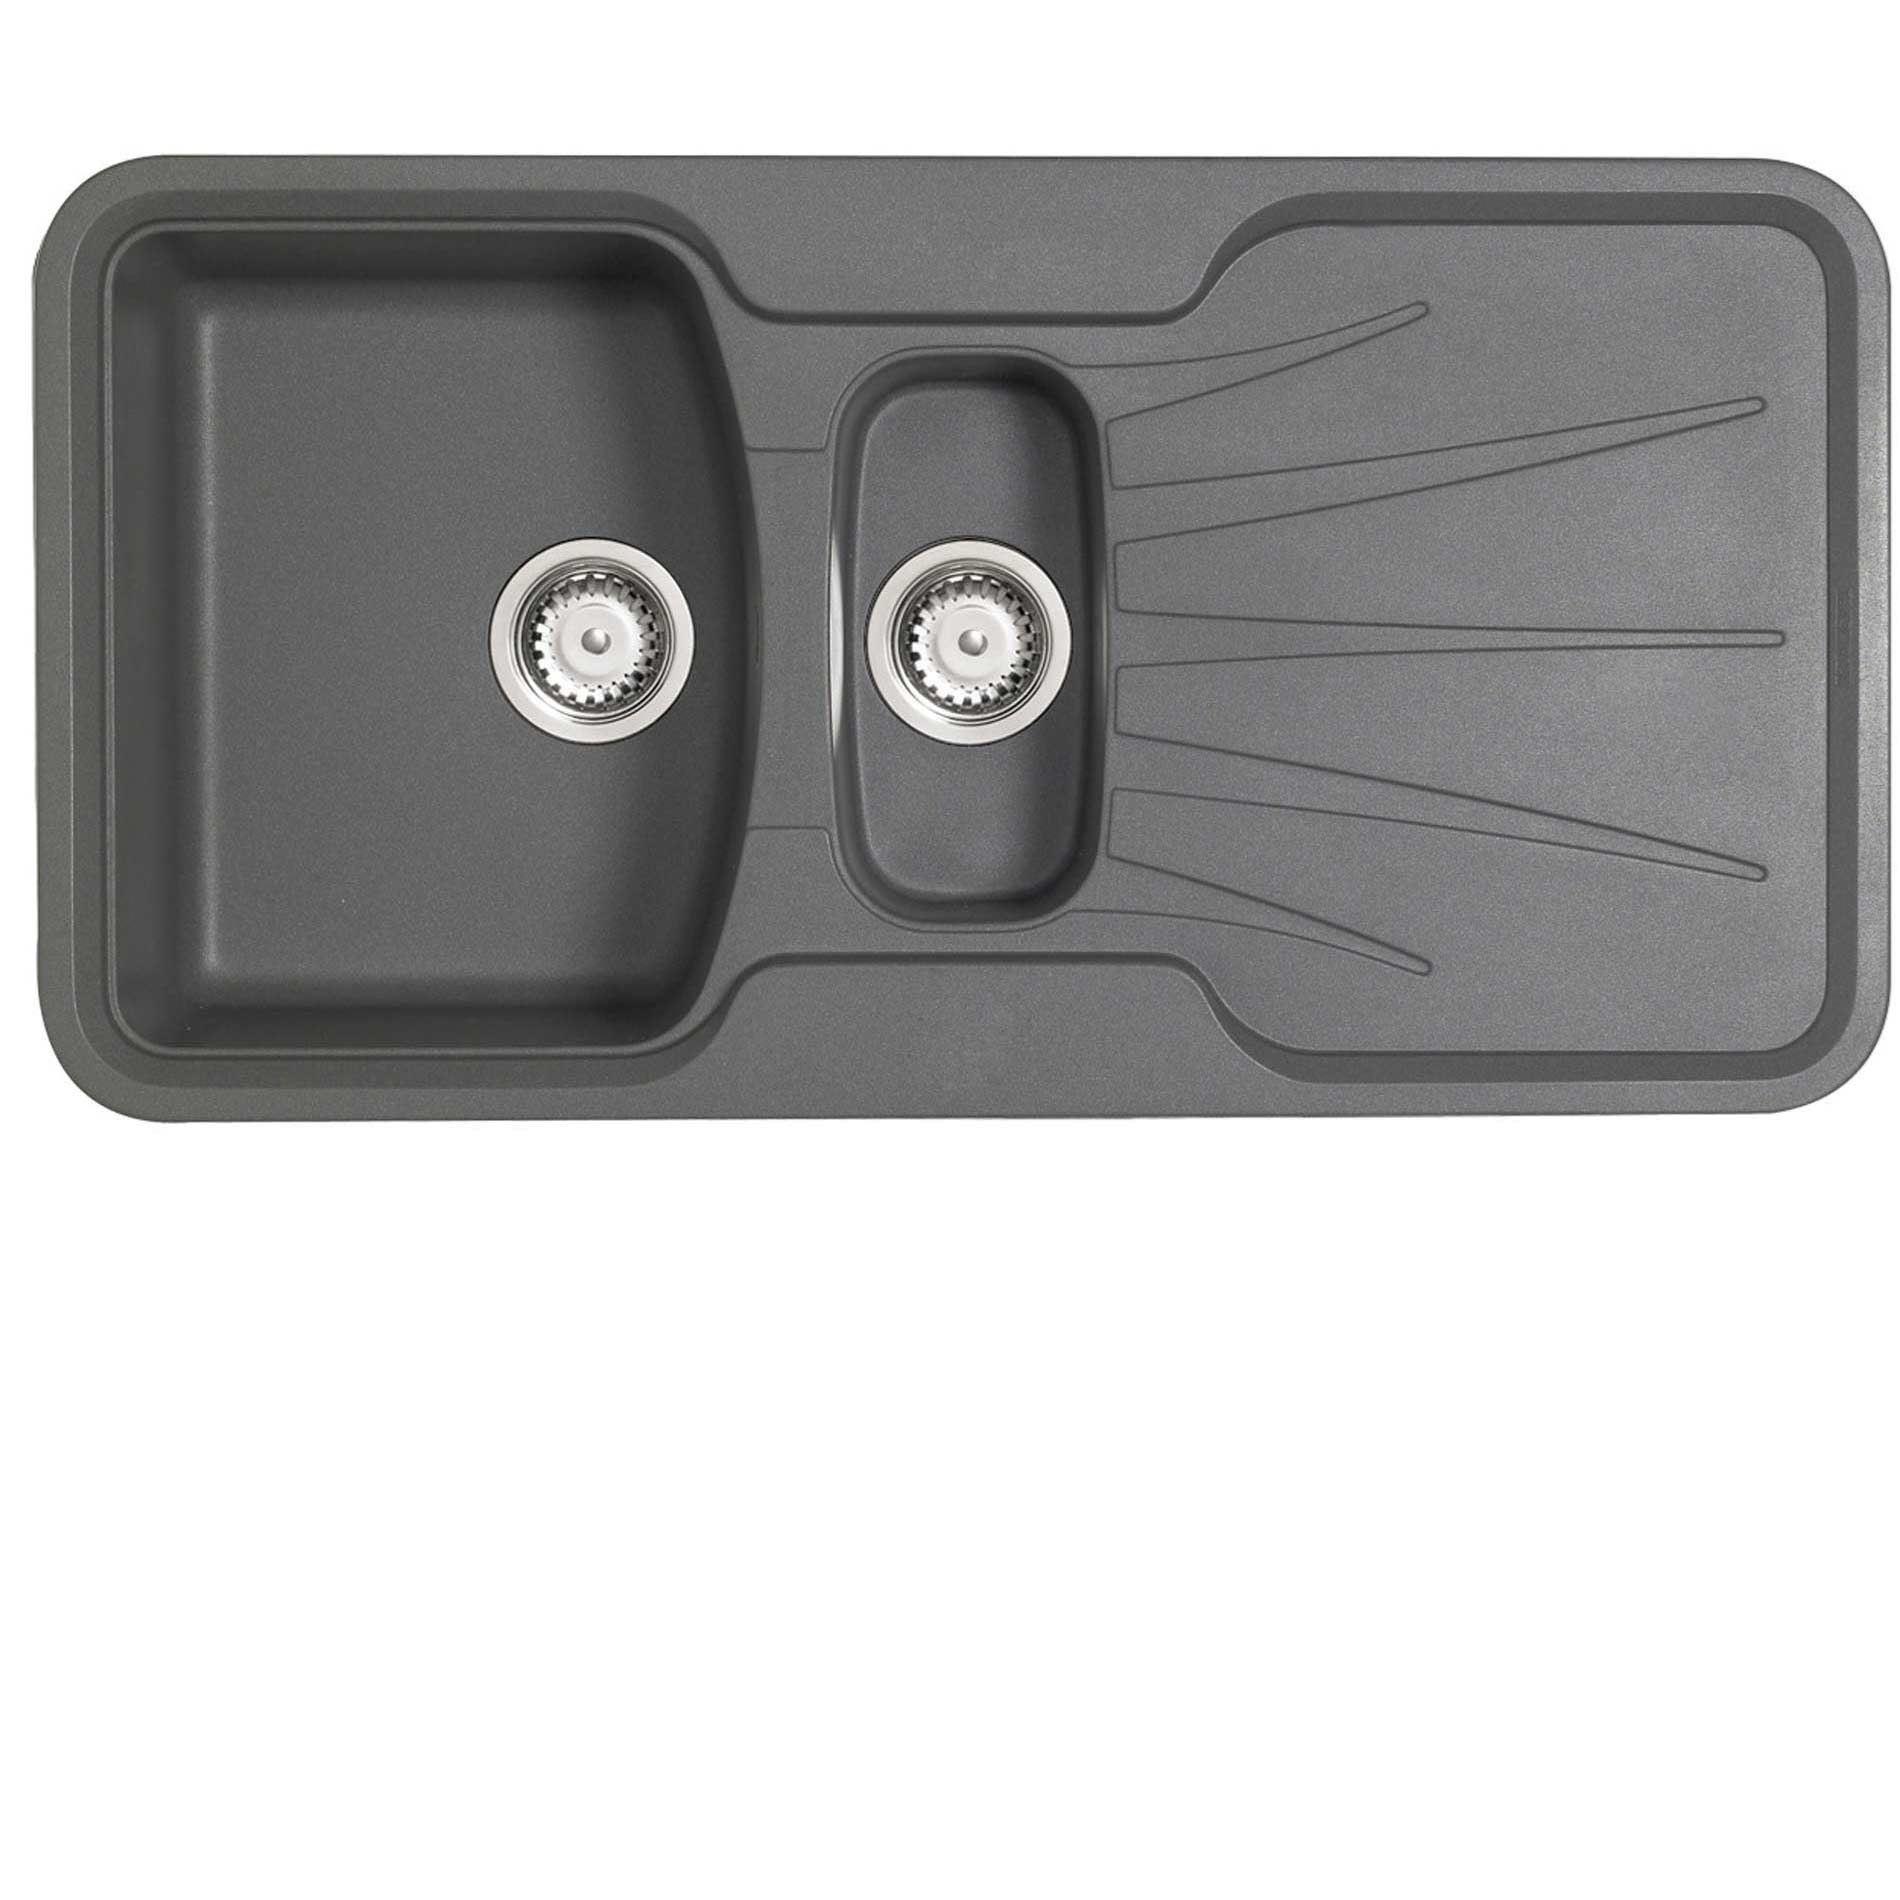 picture of korona 1 5 rok metallic graphite grey granite sink astracast  korona 1 5 rok metallic graphite grey granite sink      rh   kitchensinksandtaps co uk